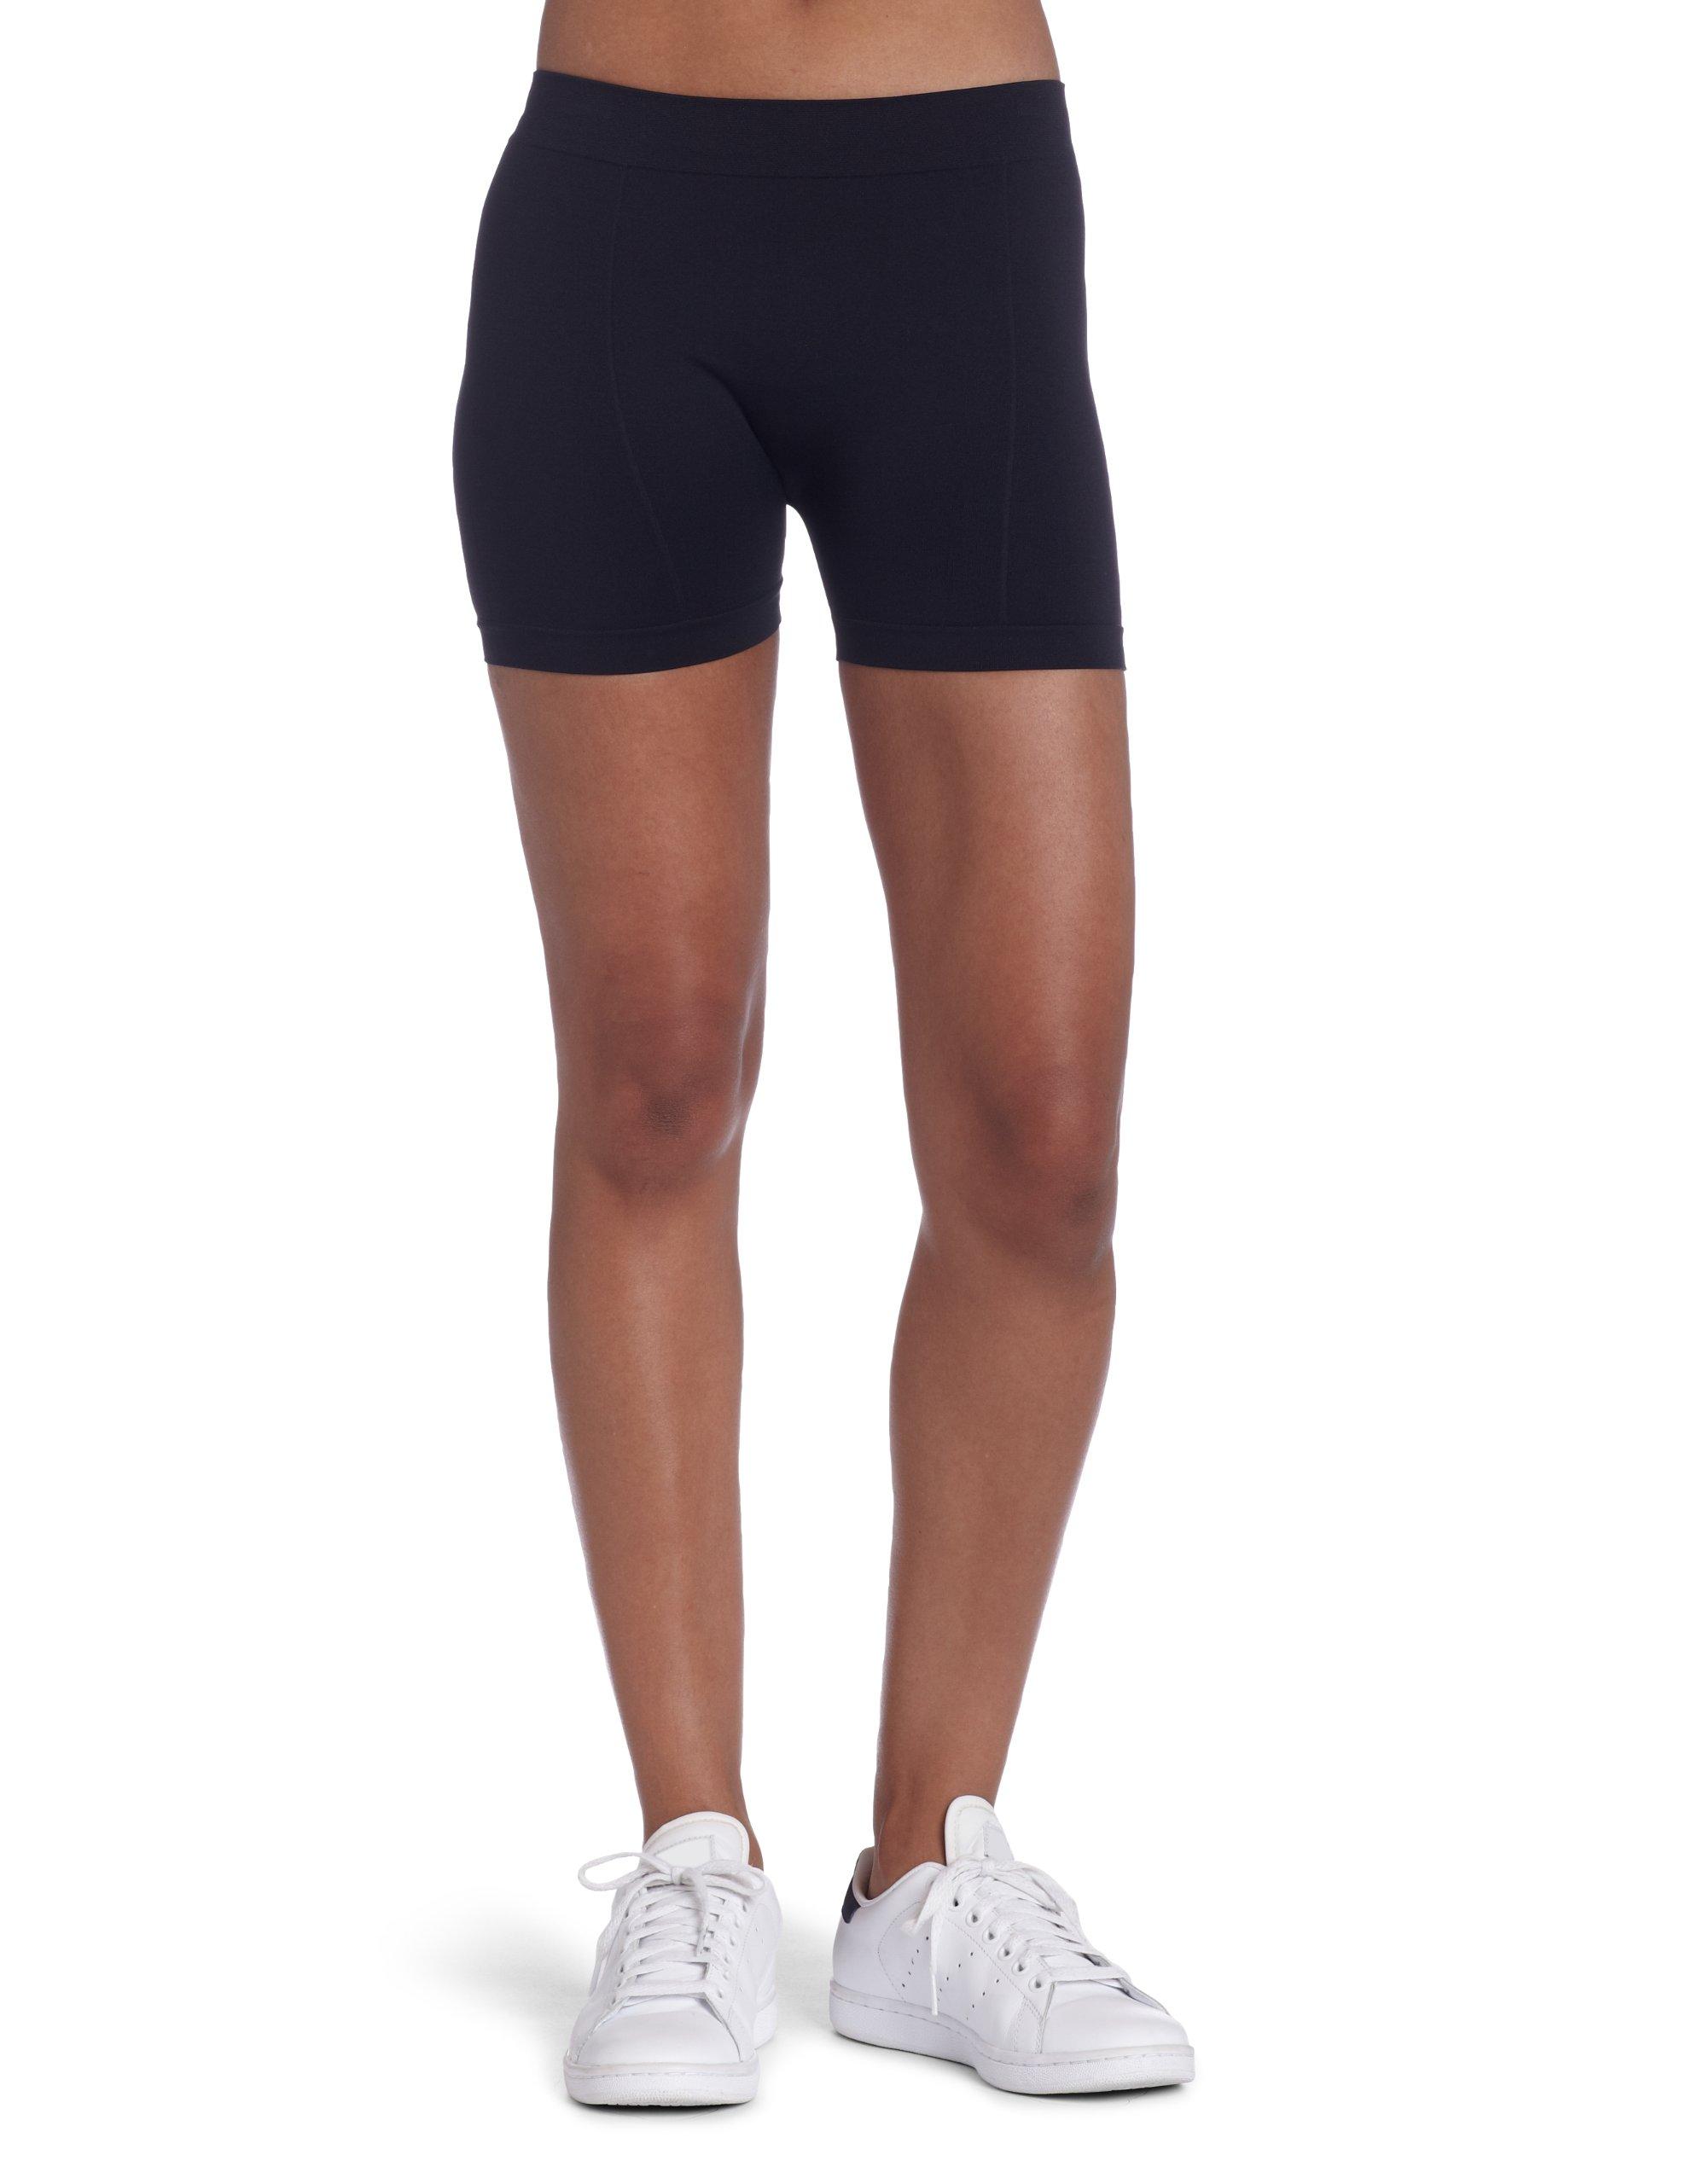 Bollé Women's Solid Panel Seamless Tennis Short, Black, X-Small